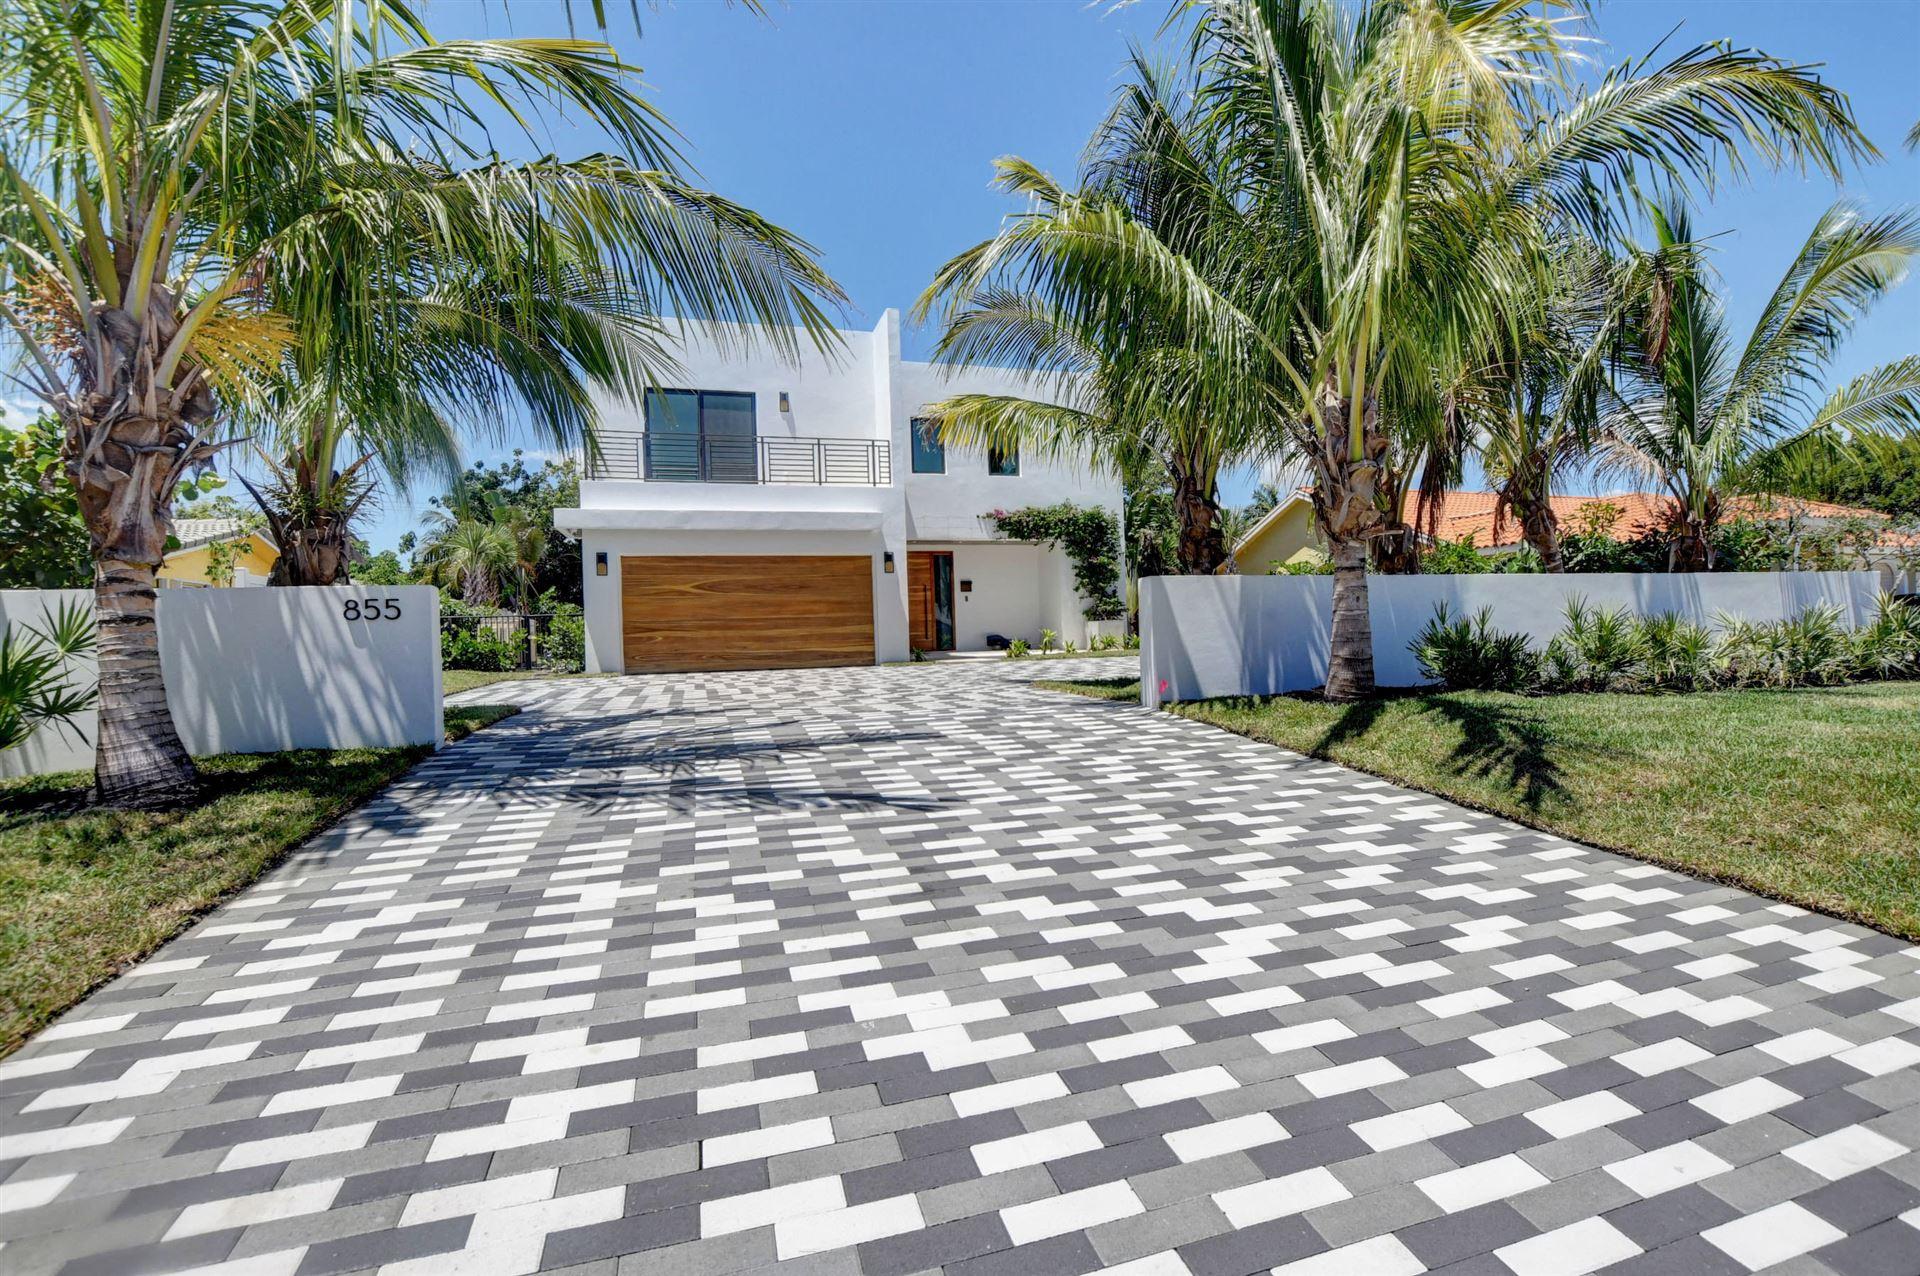 855 NW 4th Avenue, Boca Raton, FL 33432 - MLS#: RX-10739683